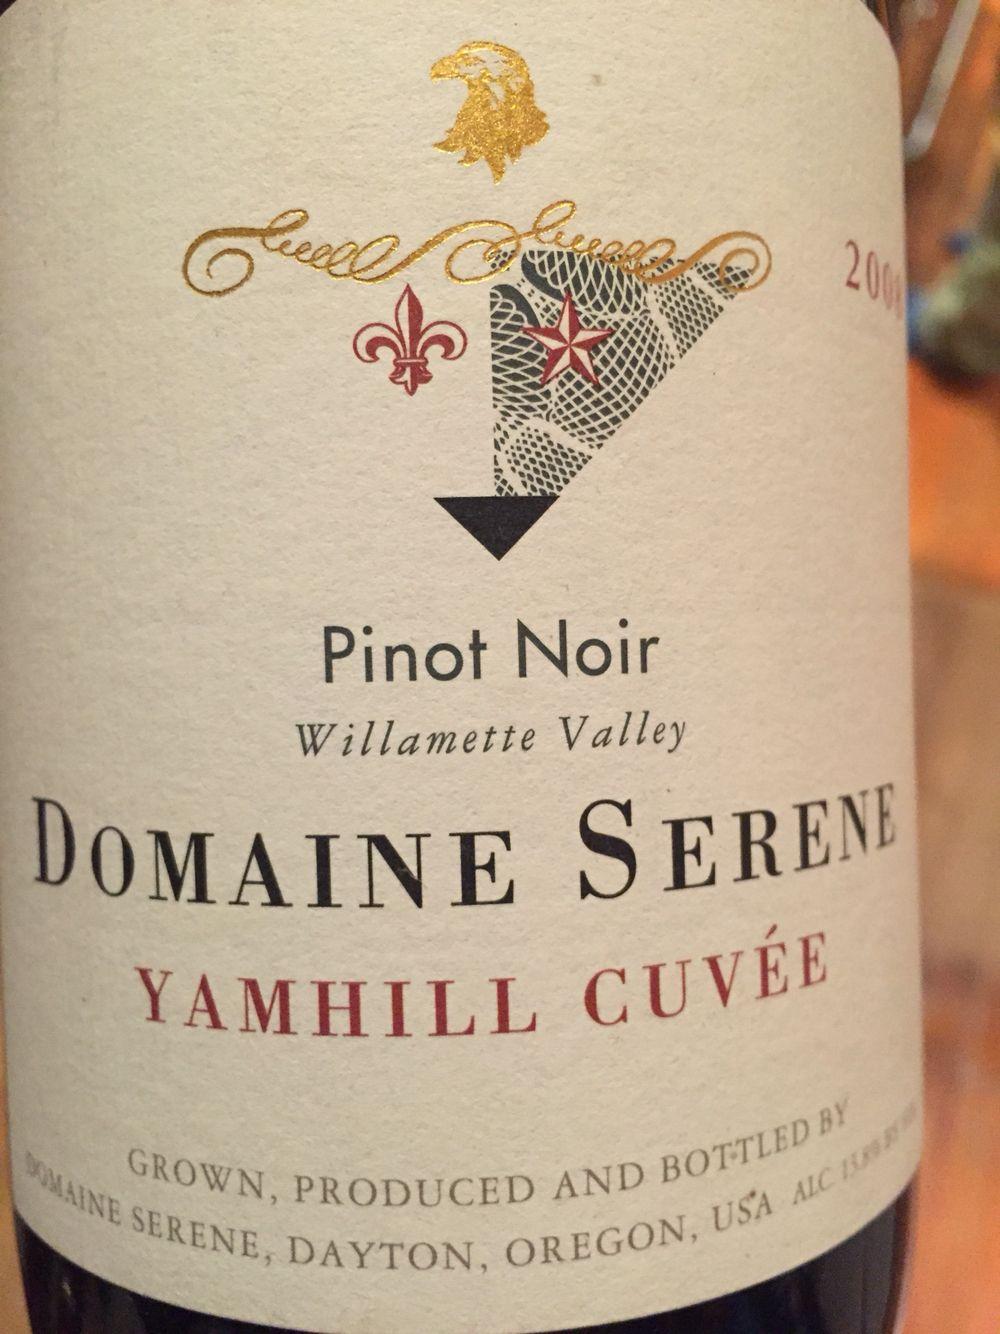 2008 Domaine Serene, Yamhill Cuvée Pinot Noir, Williamette Valley, Oregon